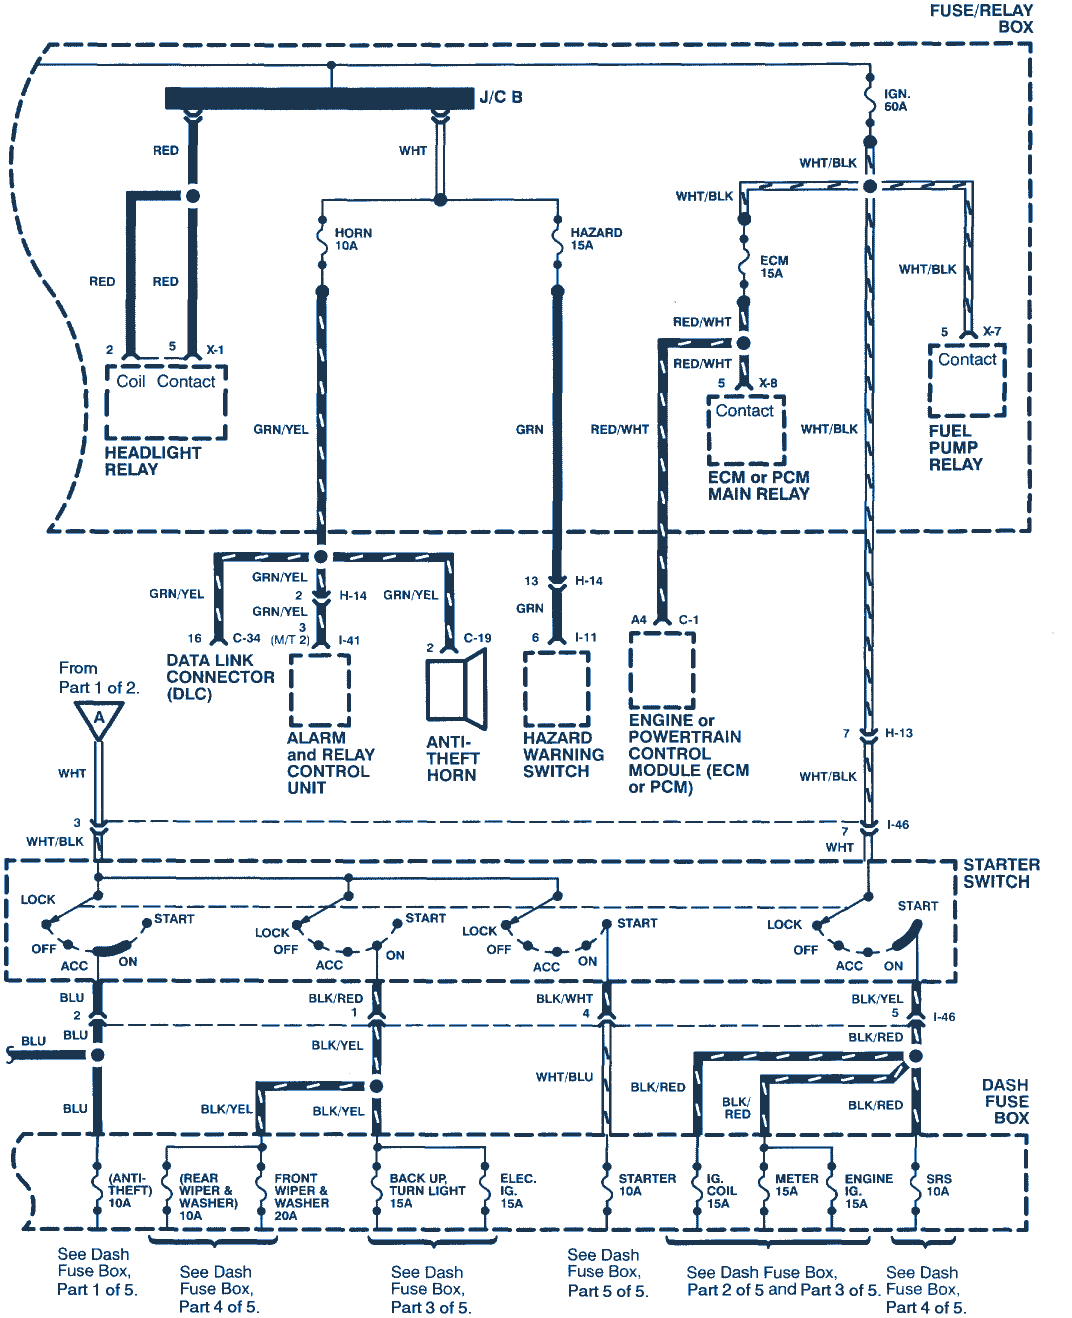 1998 isuzu rodeo 3 2 6 cyl wiring diagram gif